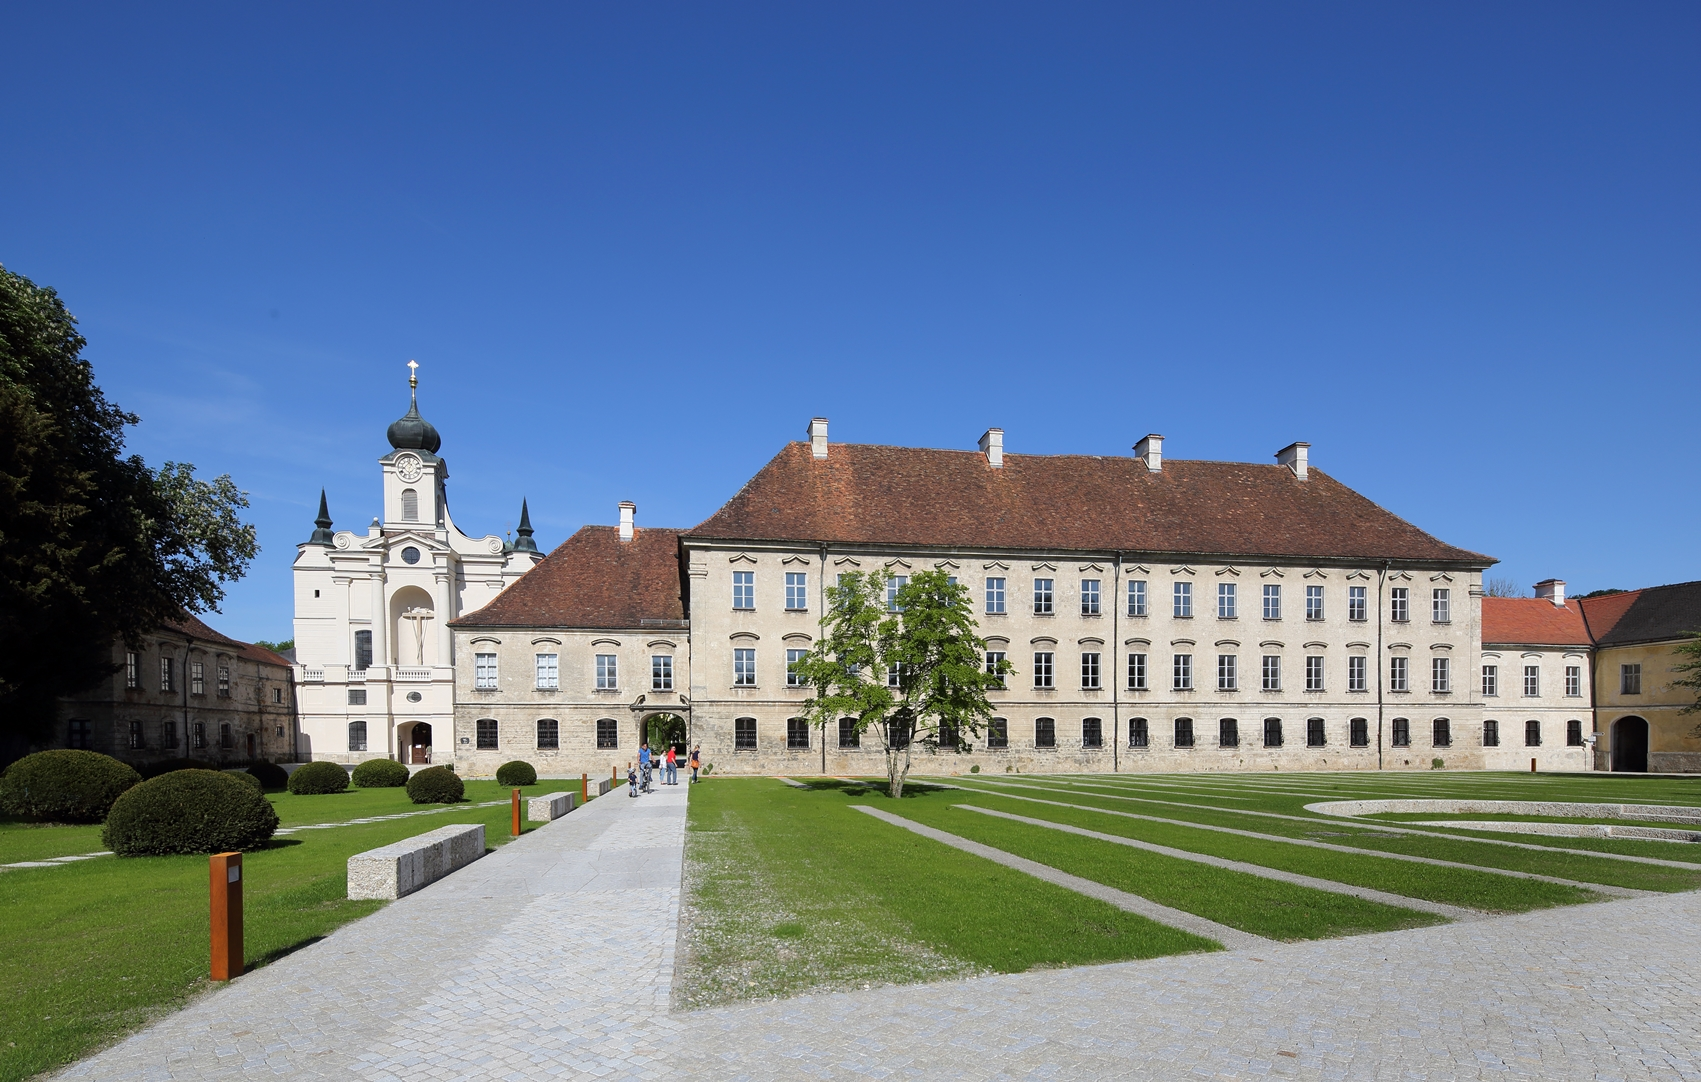 kloster-raitenhaslach_16-05-26_7798